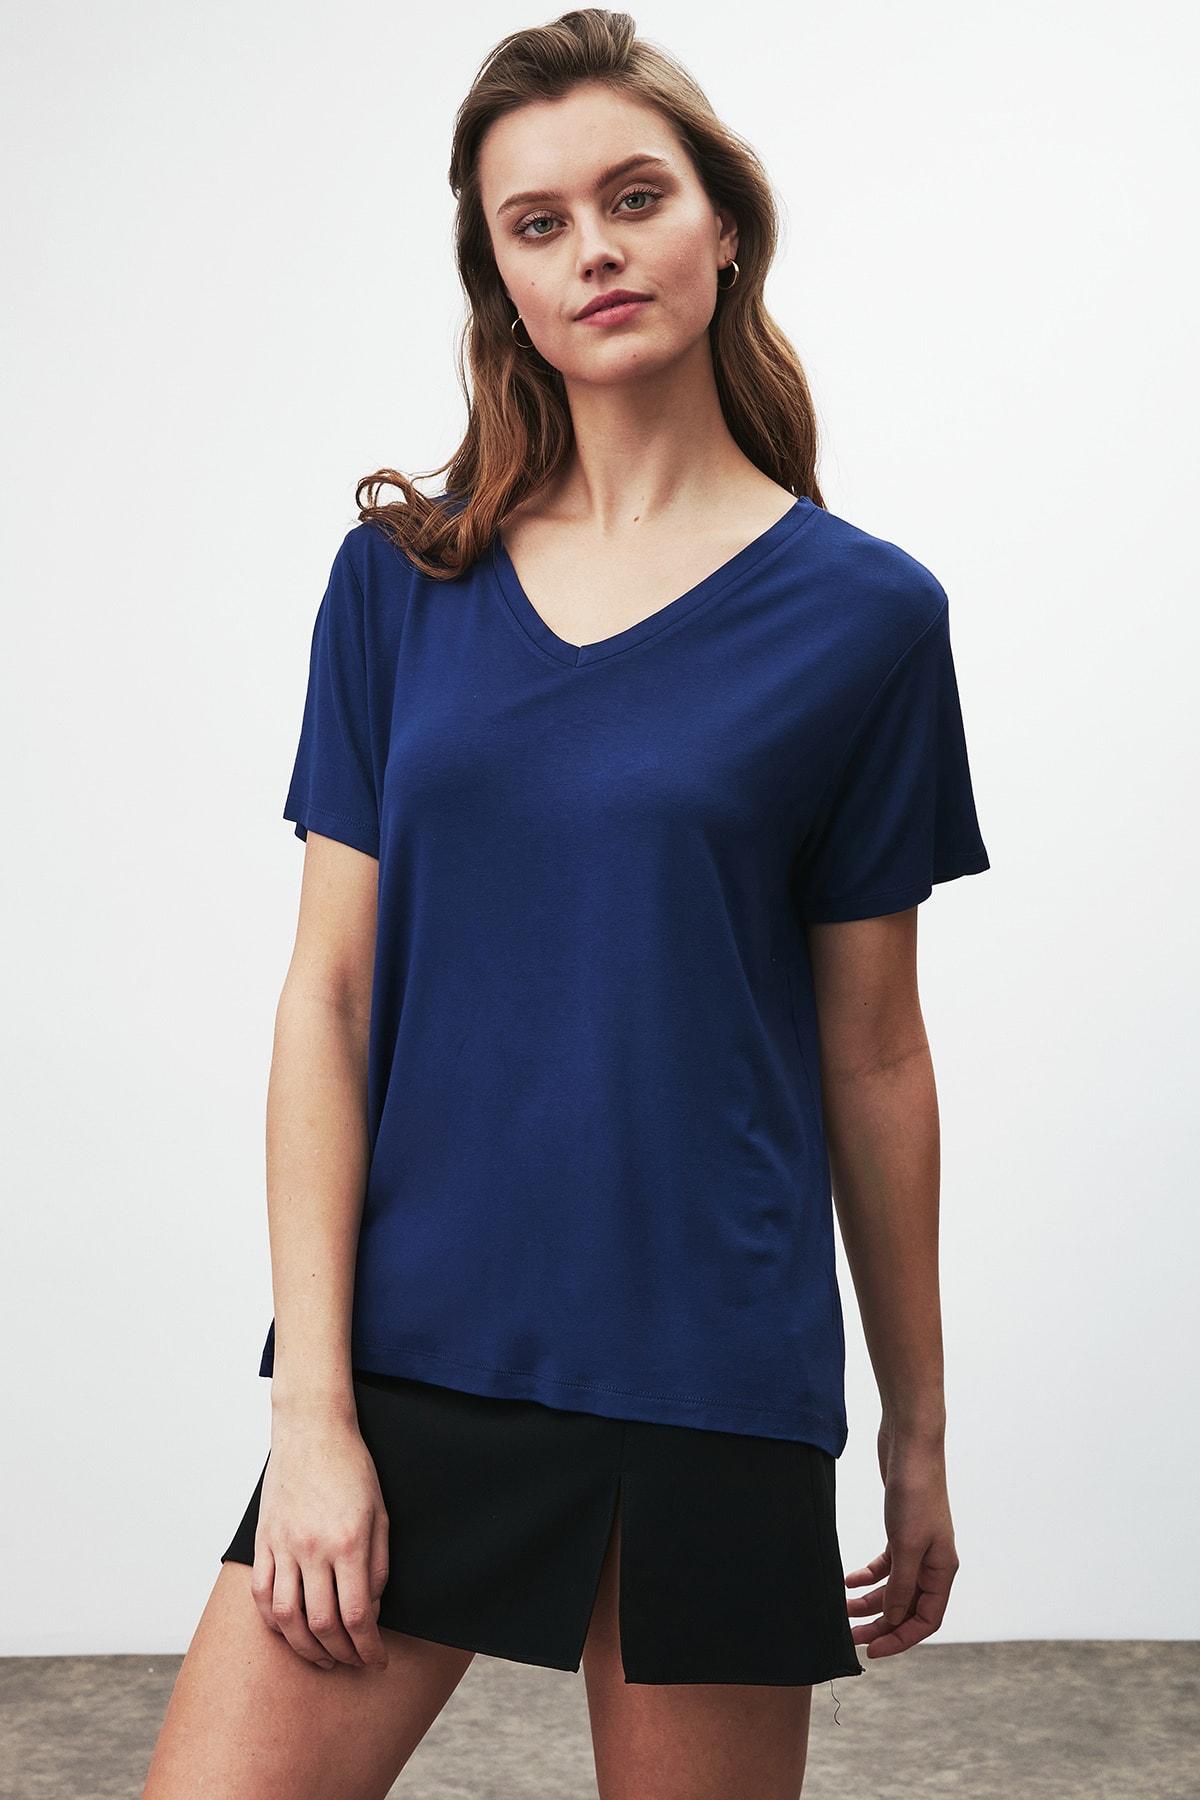 GRIMELANGE Vıolet Kadın Lacivert Comfort Fit V Yaka Kısa Kollu T-shirt 1